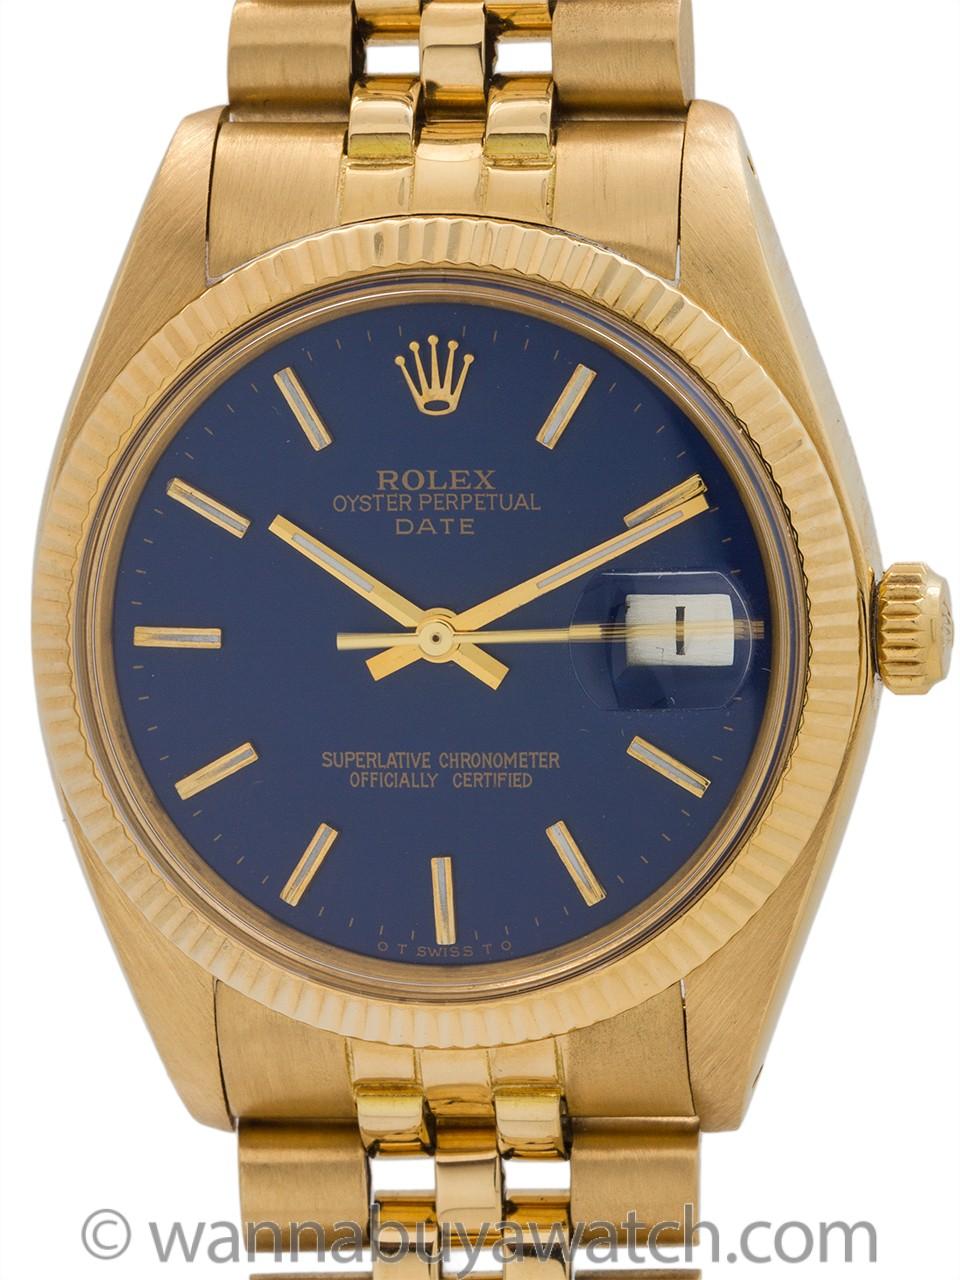 Rolex Oyster Perpetual Date ref 15037 18K YG circa 1980